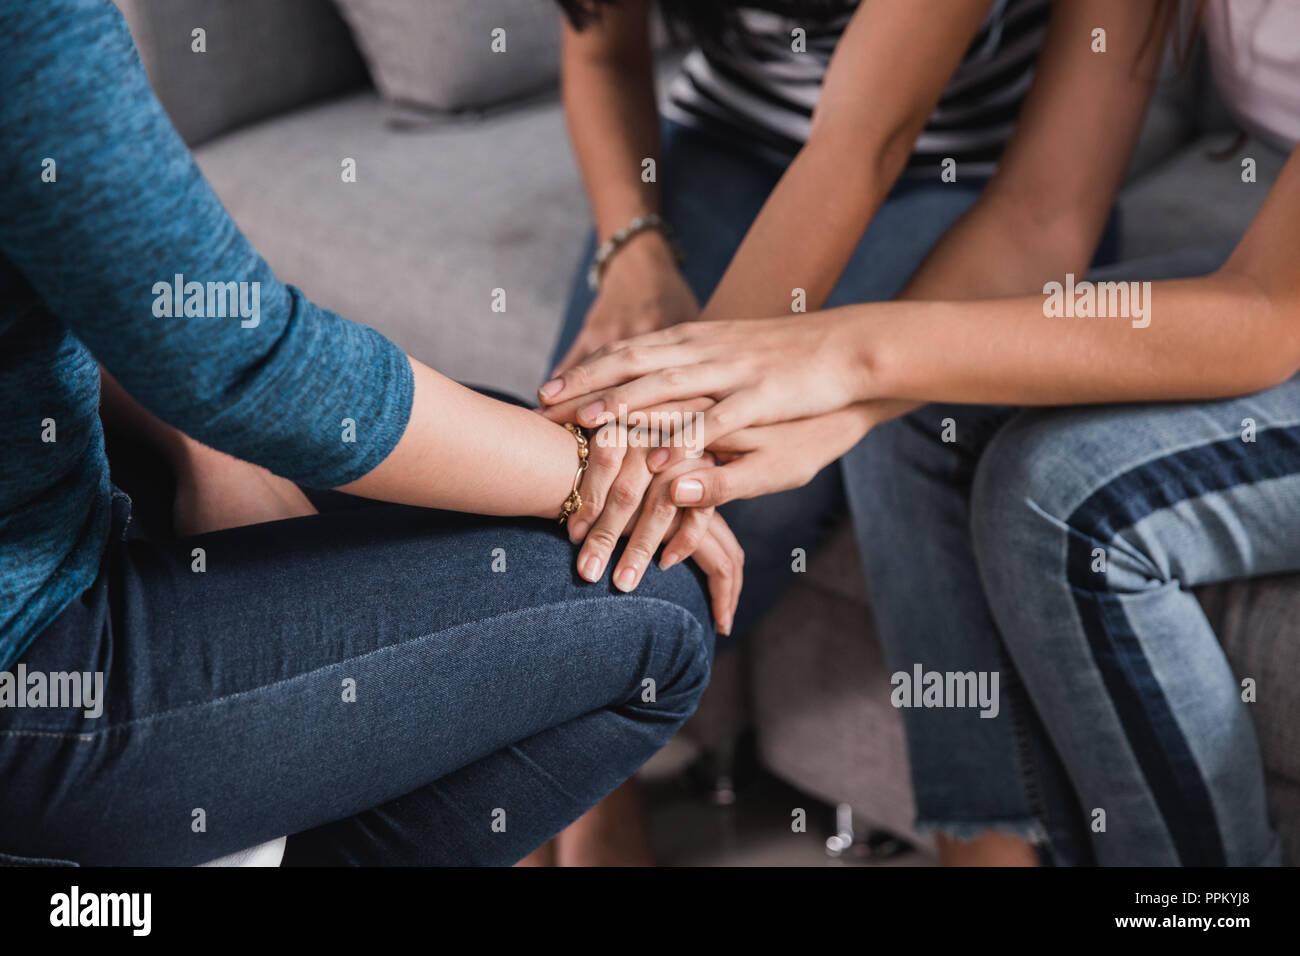 hand stack calming sad friend  - Stock Image